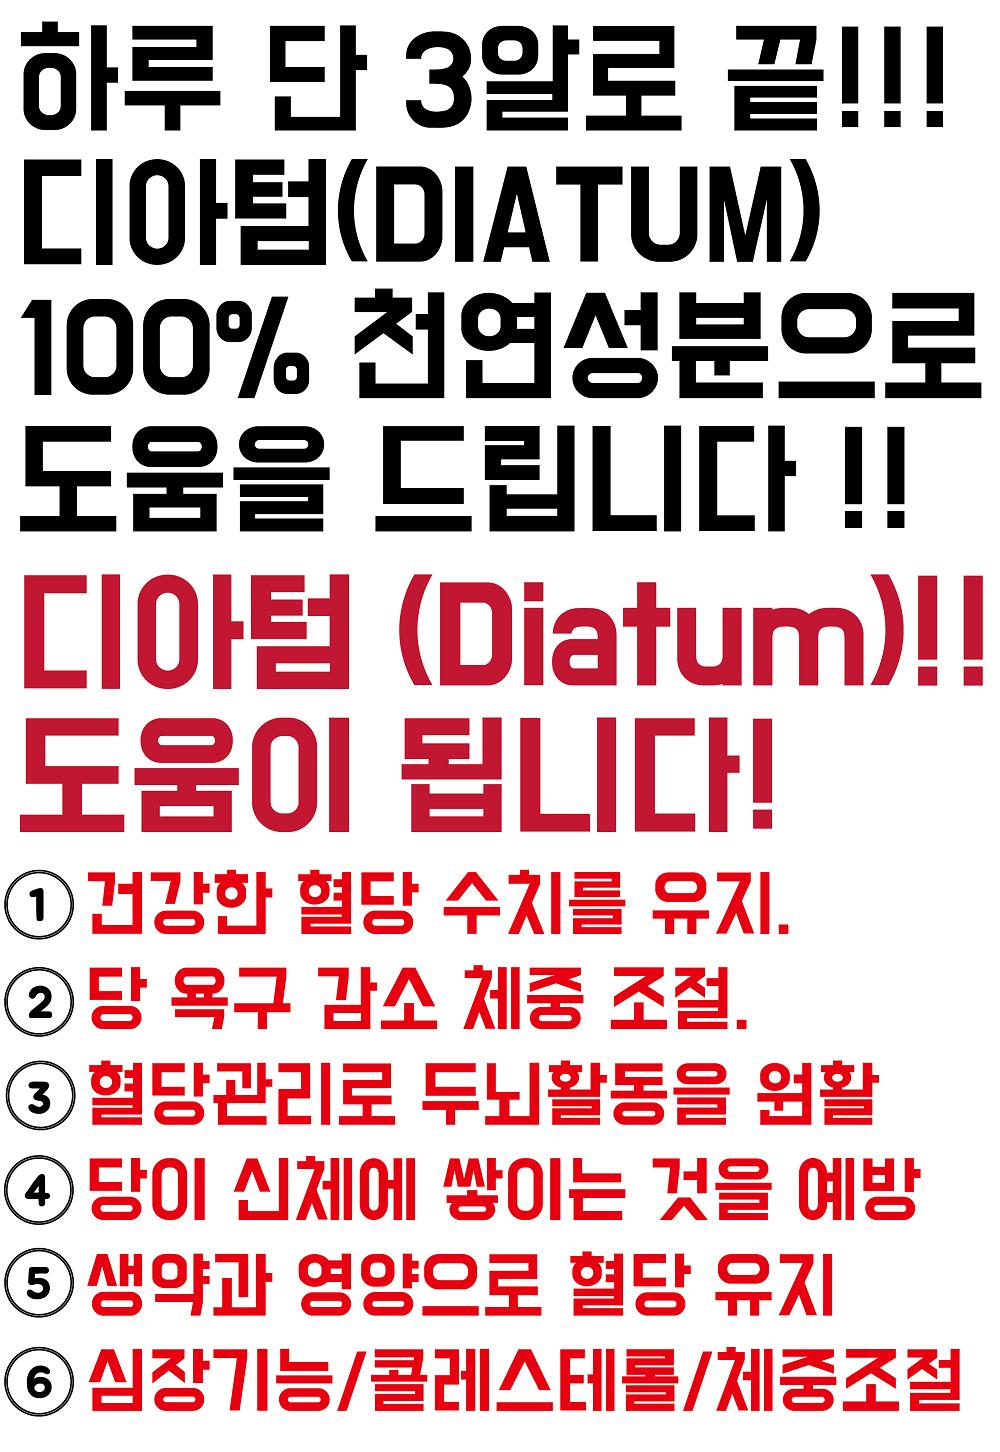 diatum_page2.png